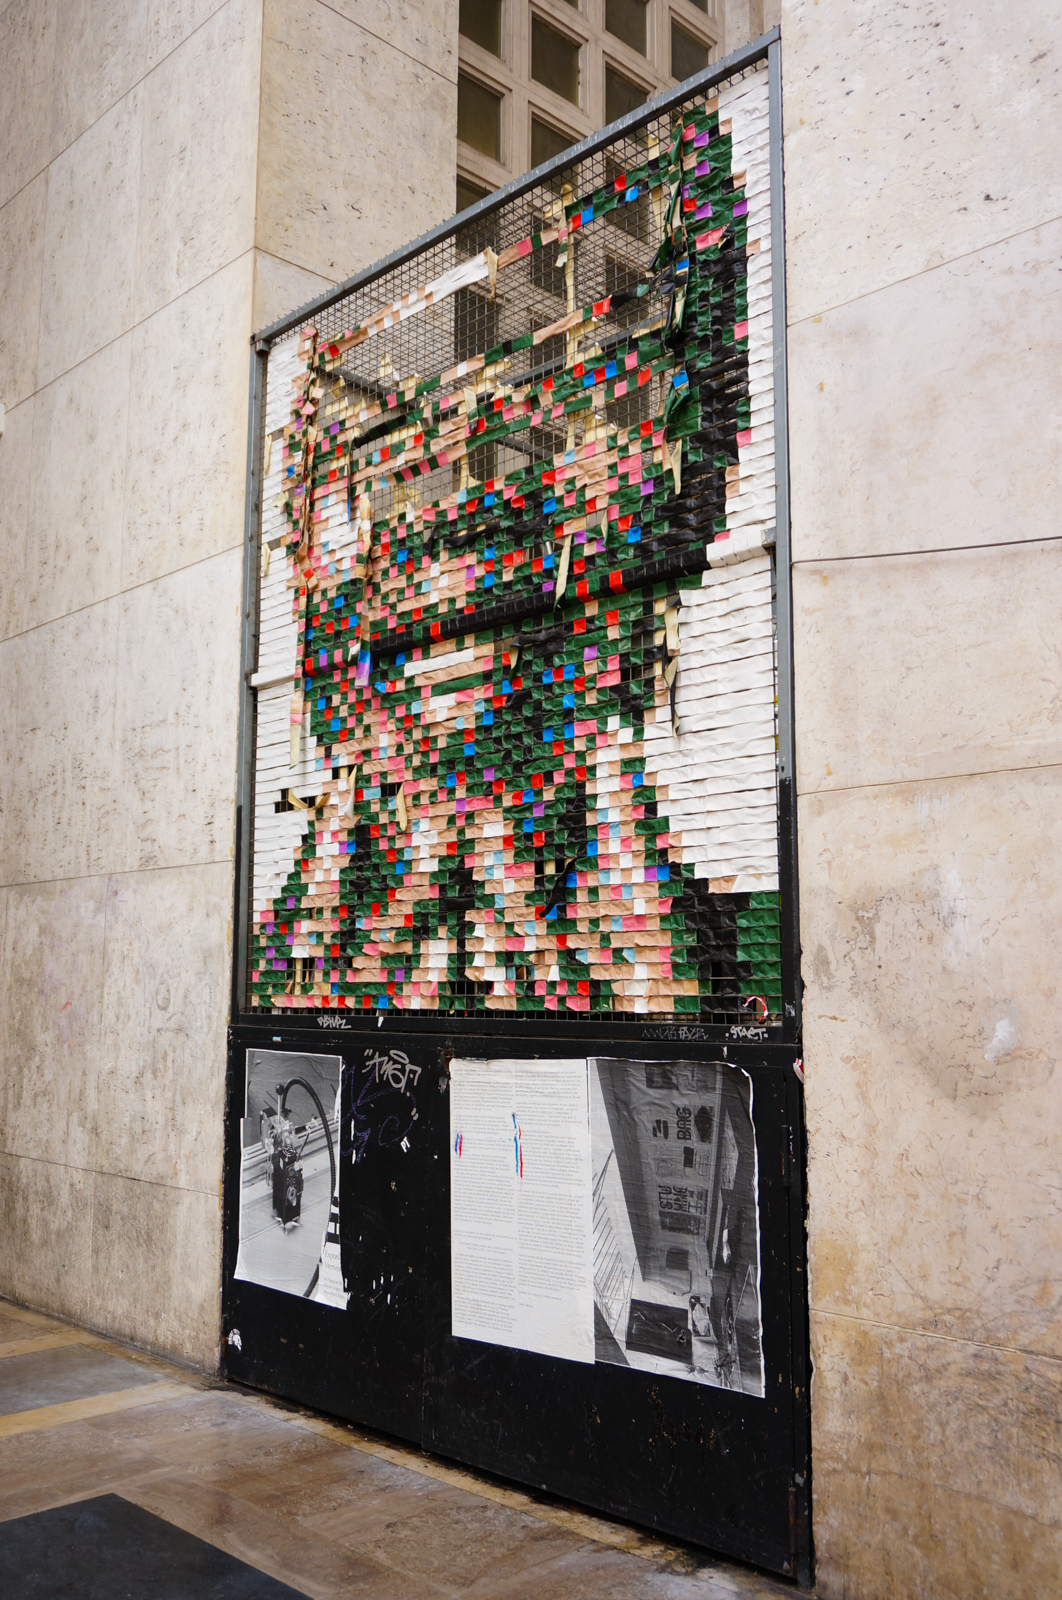 palais tokyo, musée art contemporain, musée art contemporain paris, centre d'art contemporain, musée d'art moderne paris